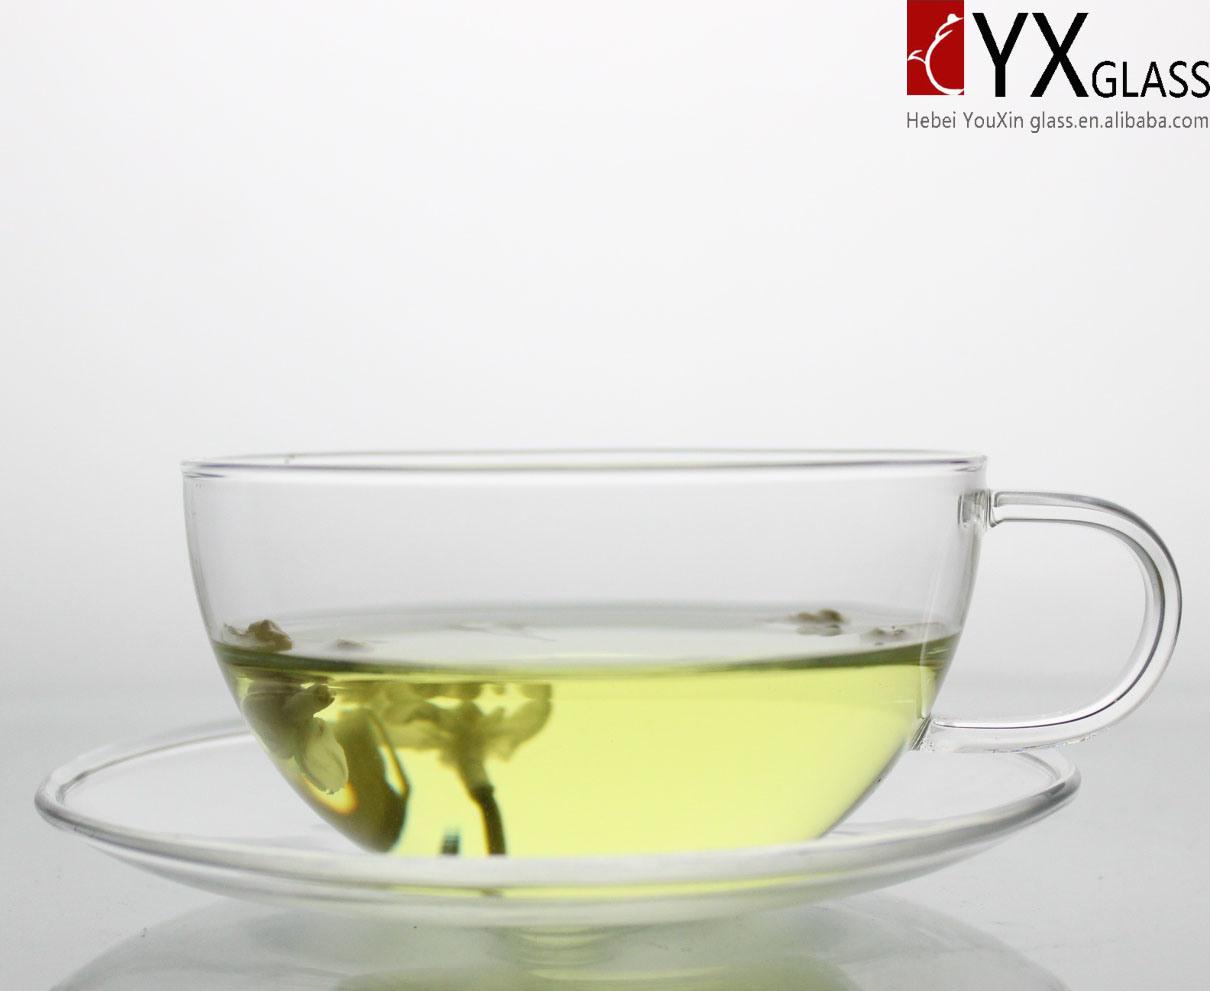 250ml Glass Tea Cup with Glass Saucer/Glass Tea Mug/ Glass coffee Cup with Saucer/Glass Coffee Mug